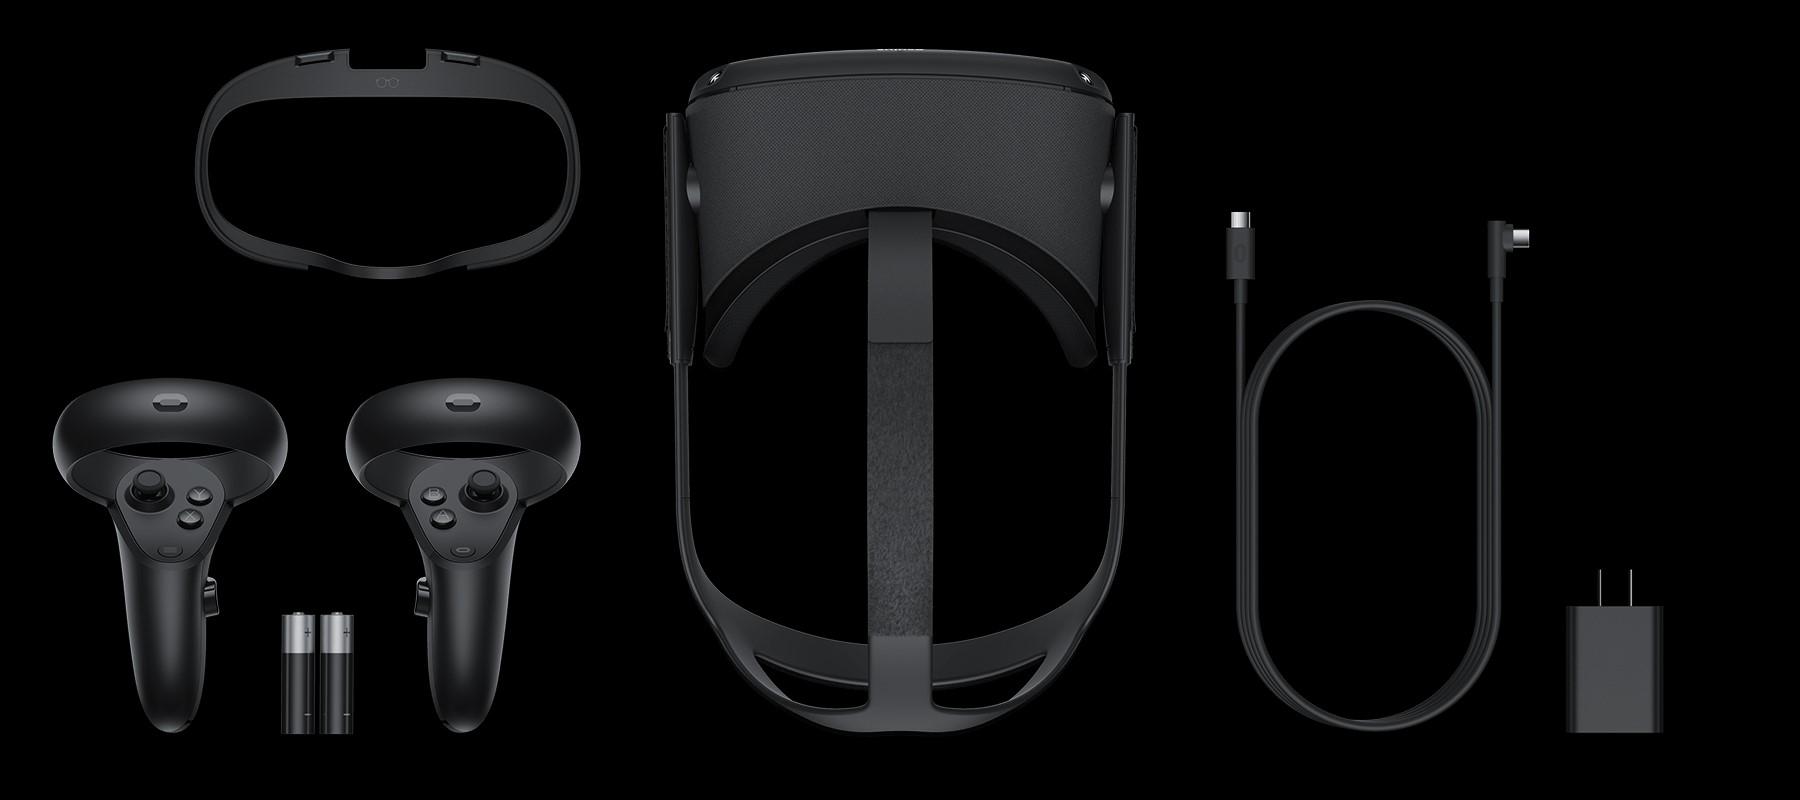 content oculus vr headset